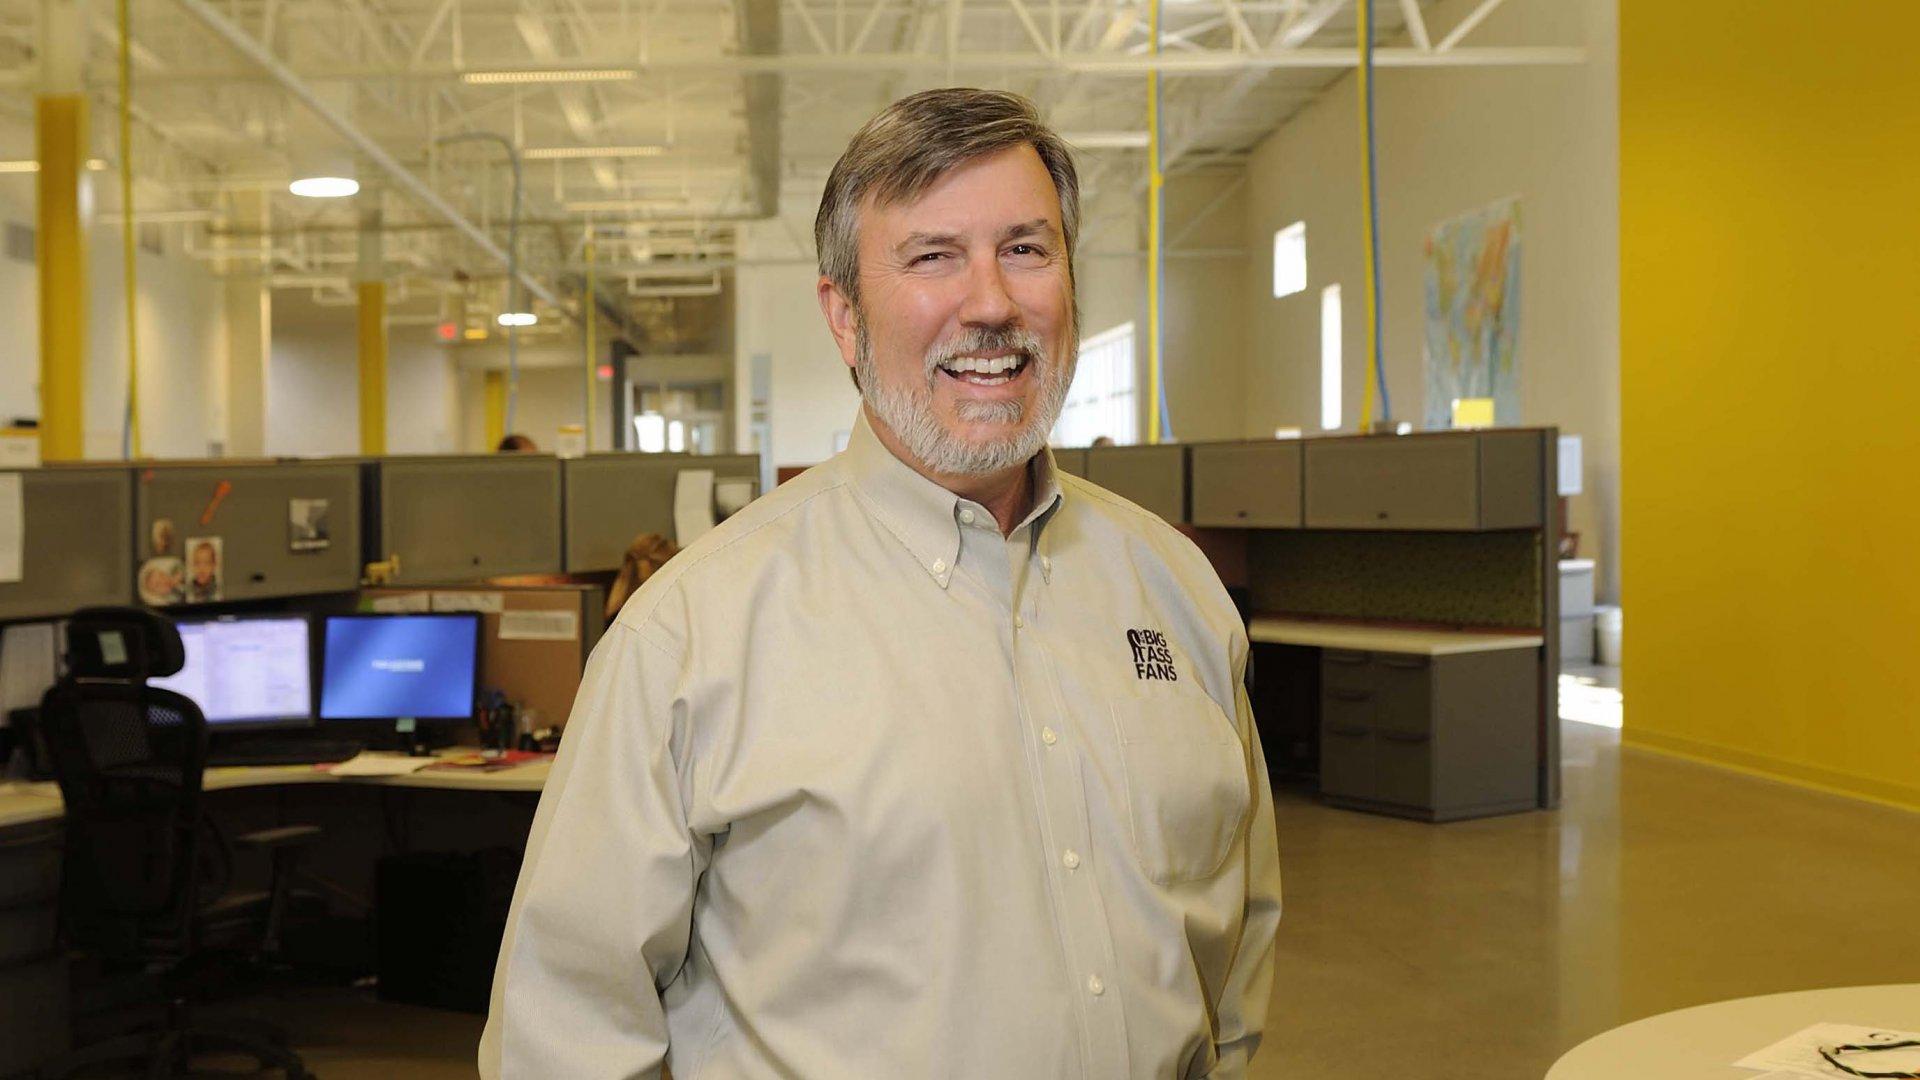 Carey Smith, Chief Big Ass of Big Ass Solutions